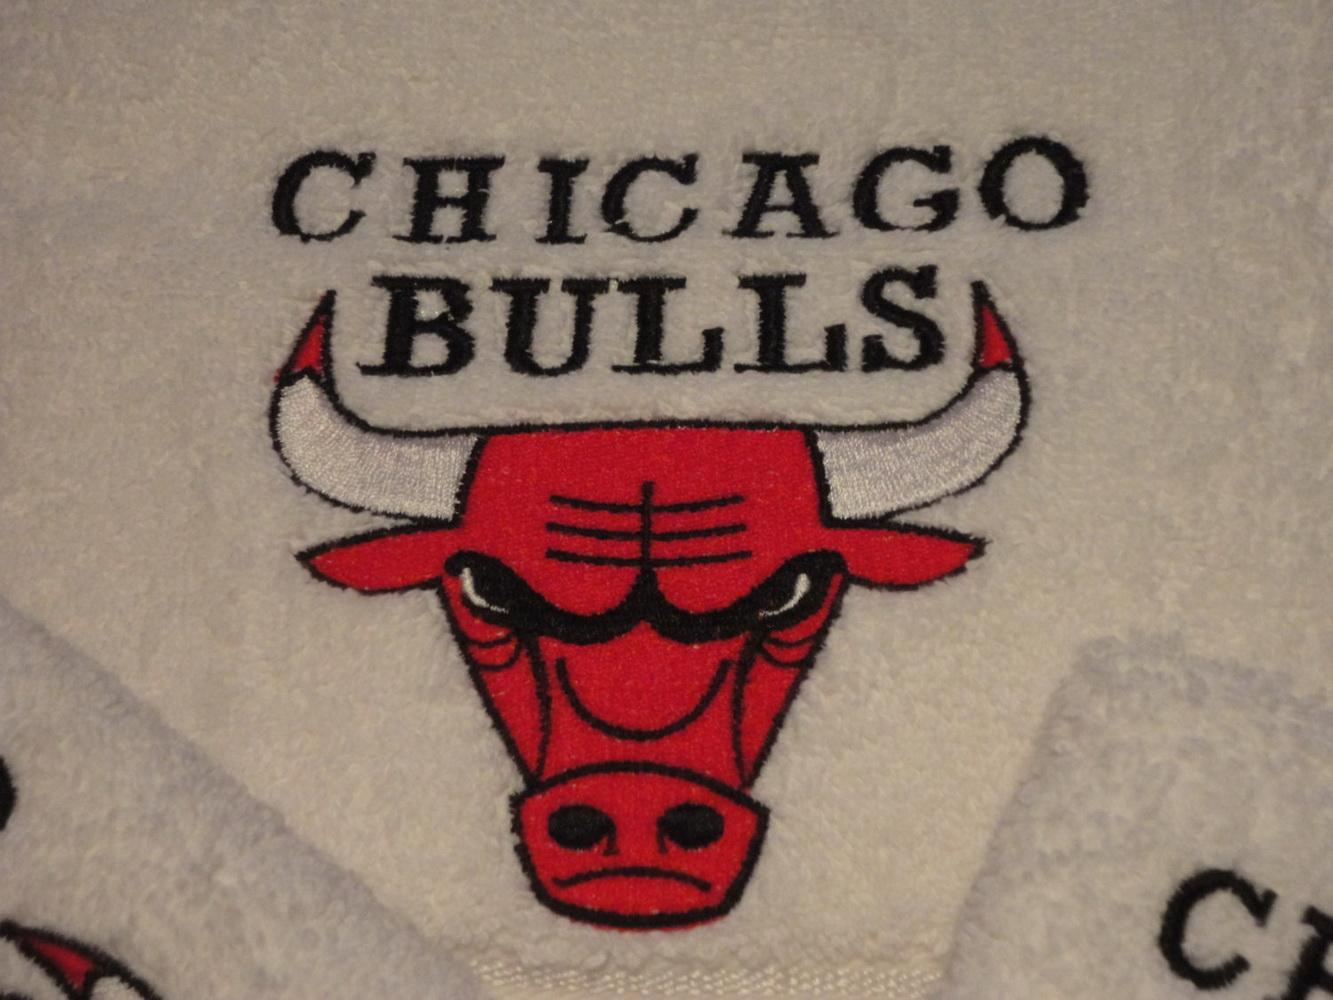 Chicago Bulls logo embroidery design.